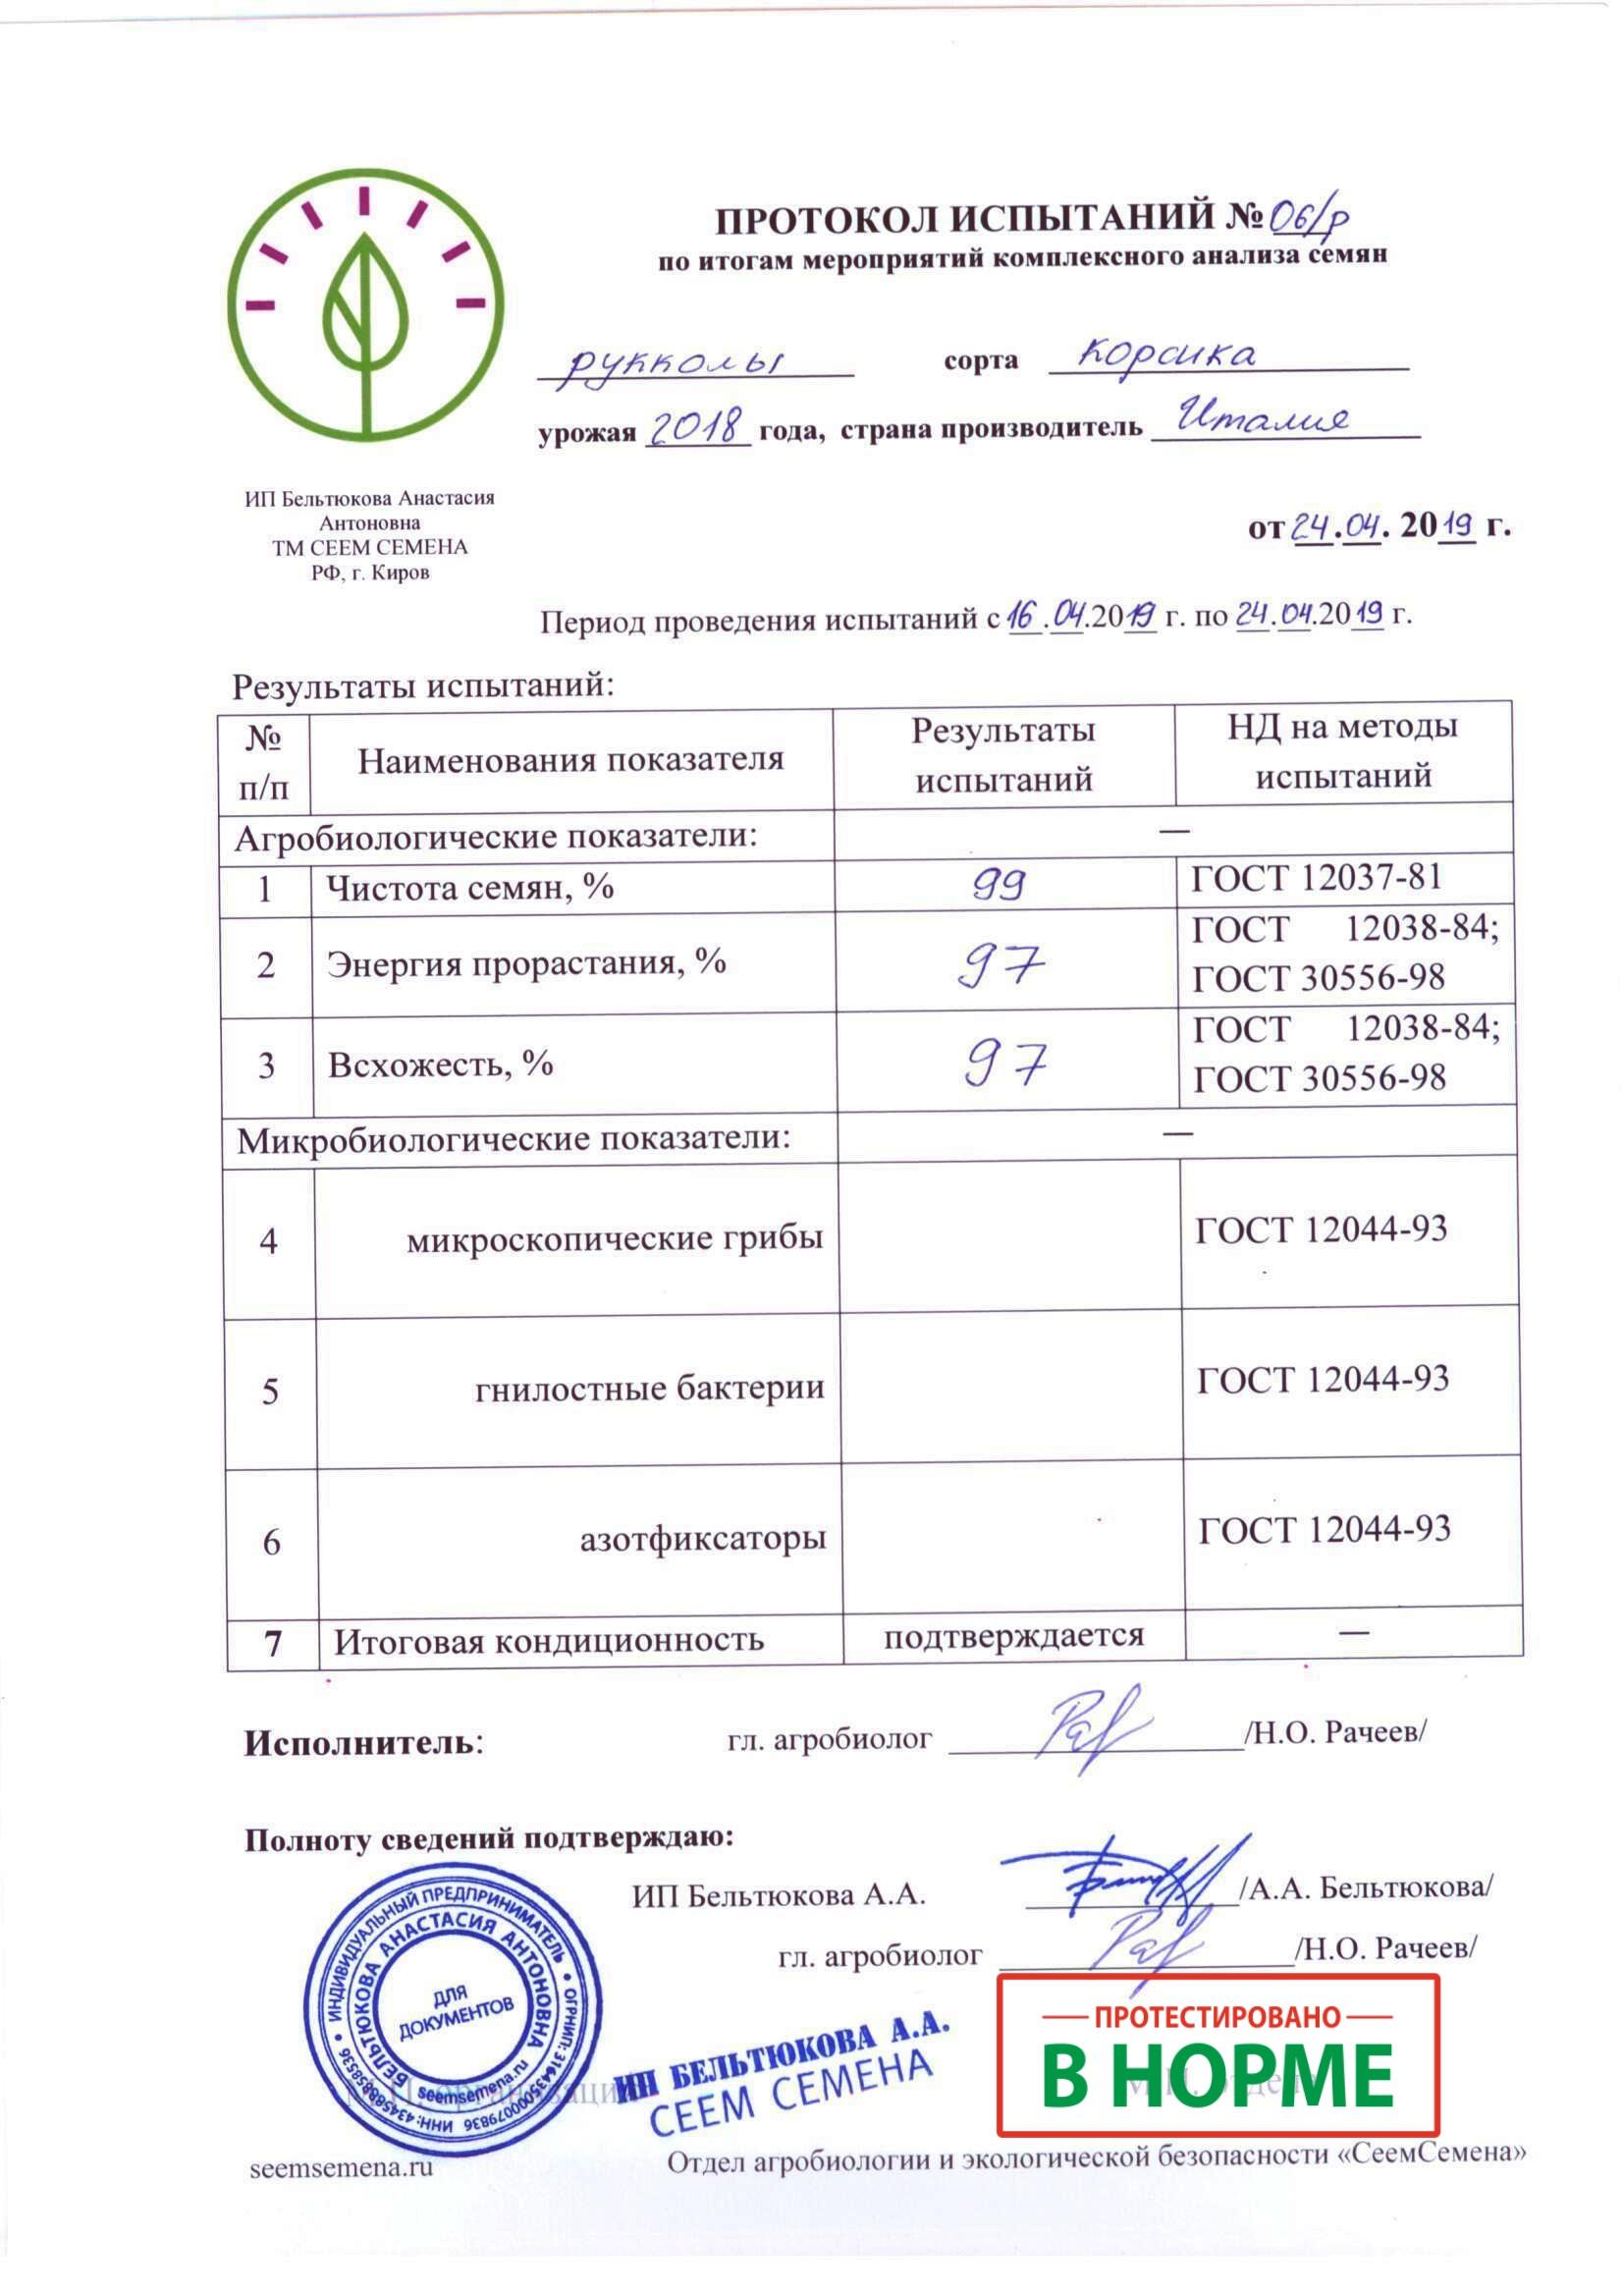 ПРОТОКОЛ ИСПЫТАНИЙ СЕМЯН РУККОЛЫ №06/р